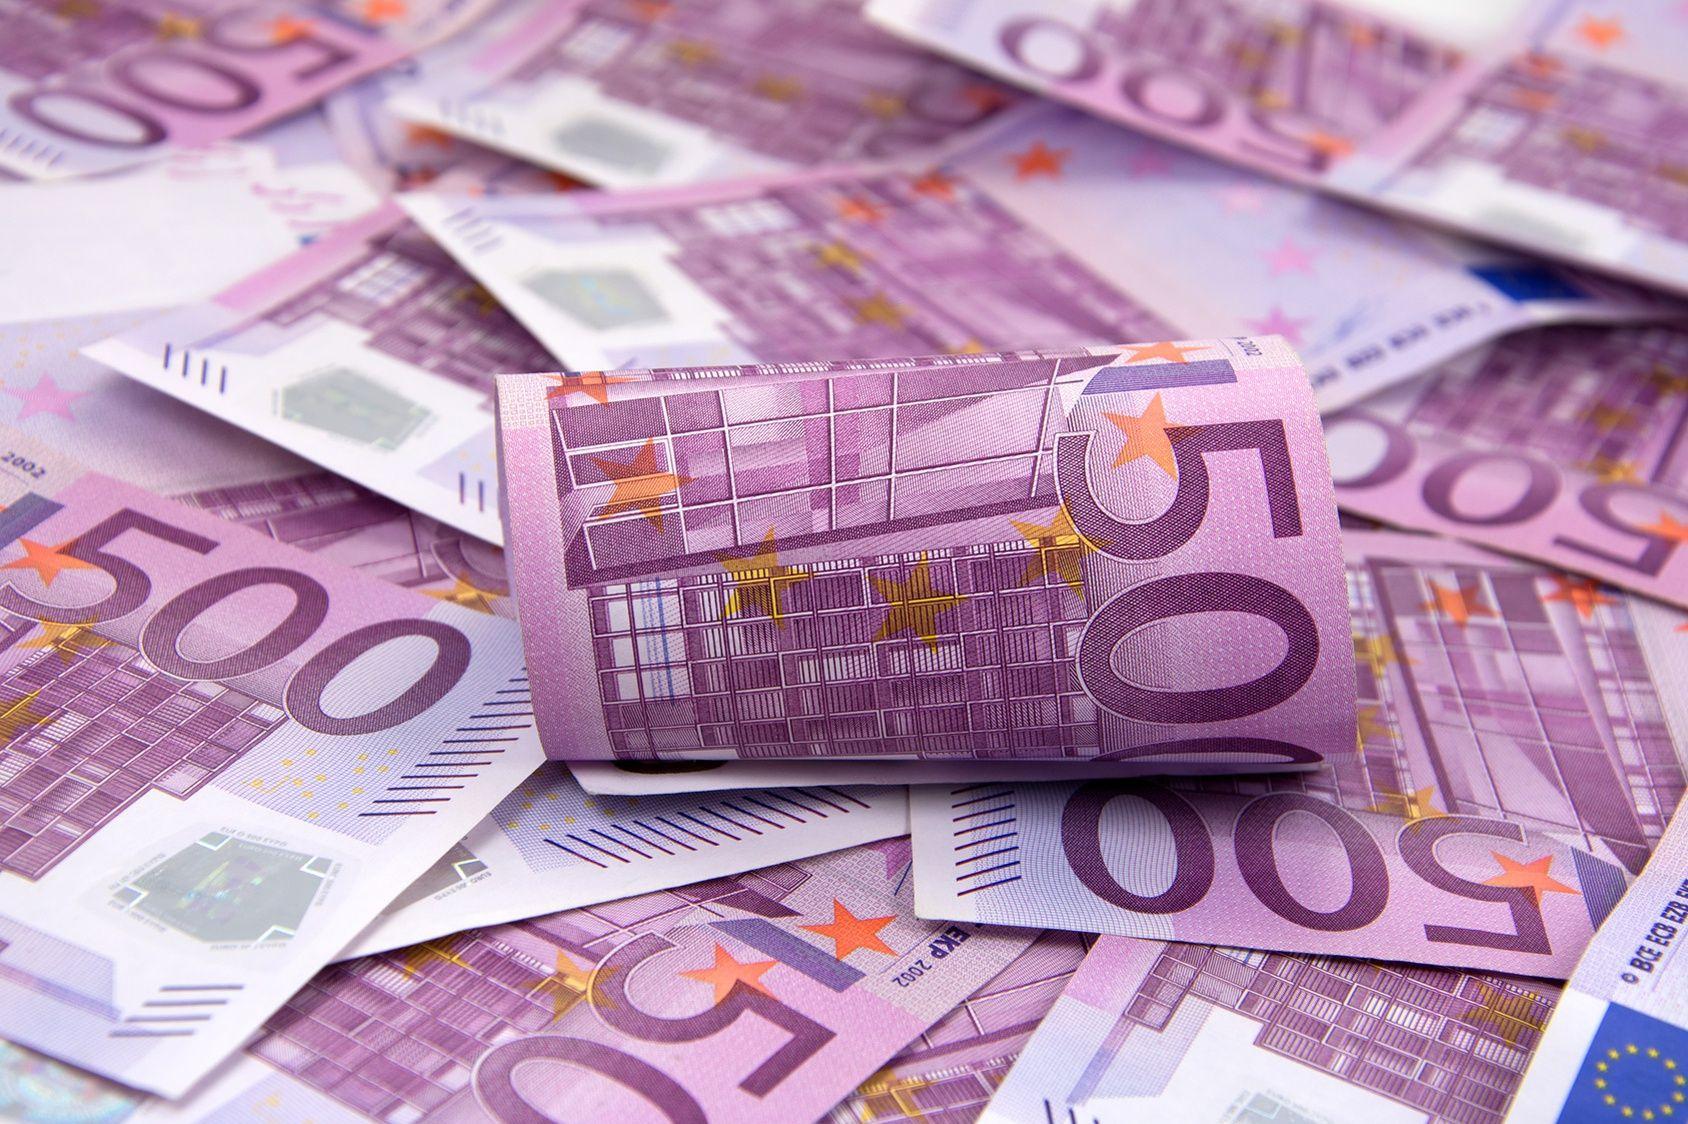 La Bce Va Cesser D'imprimer Les Billets De 500 Euros Fin 2018 serapportantà Billet De 5 Euros À Imprimer